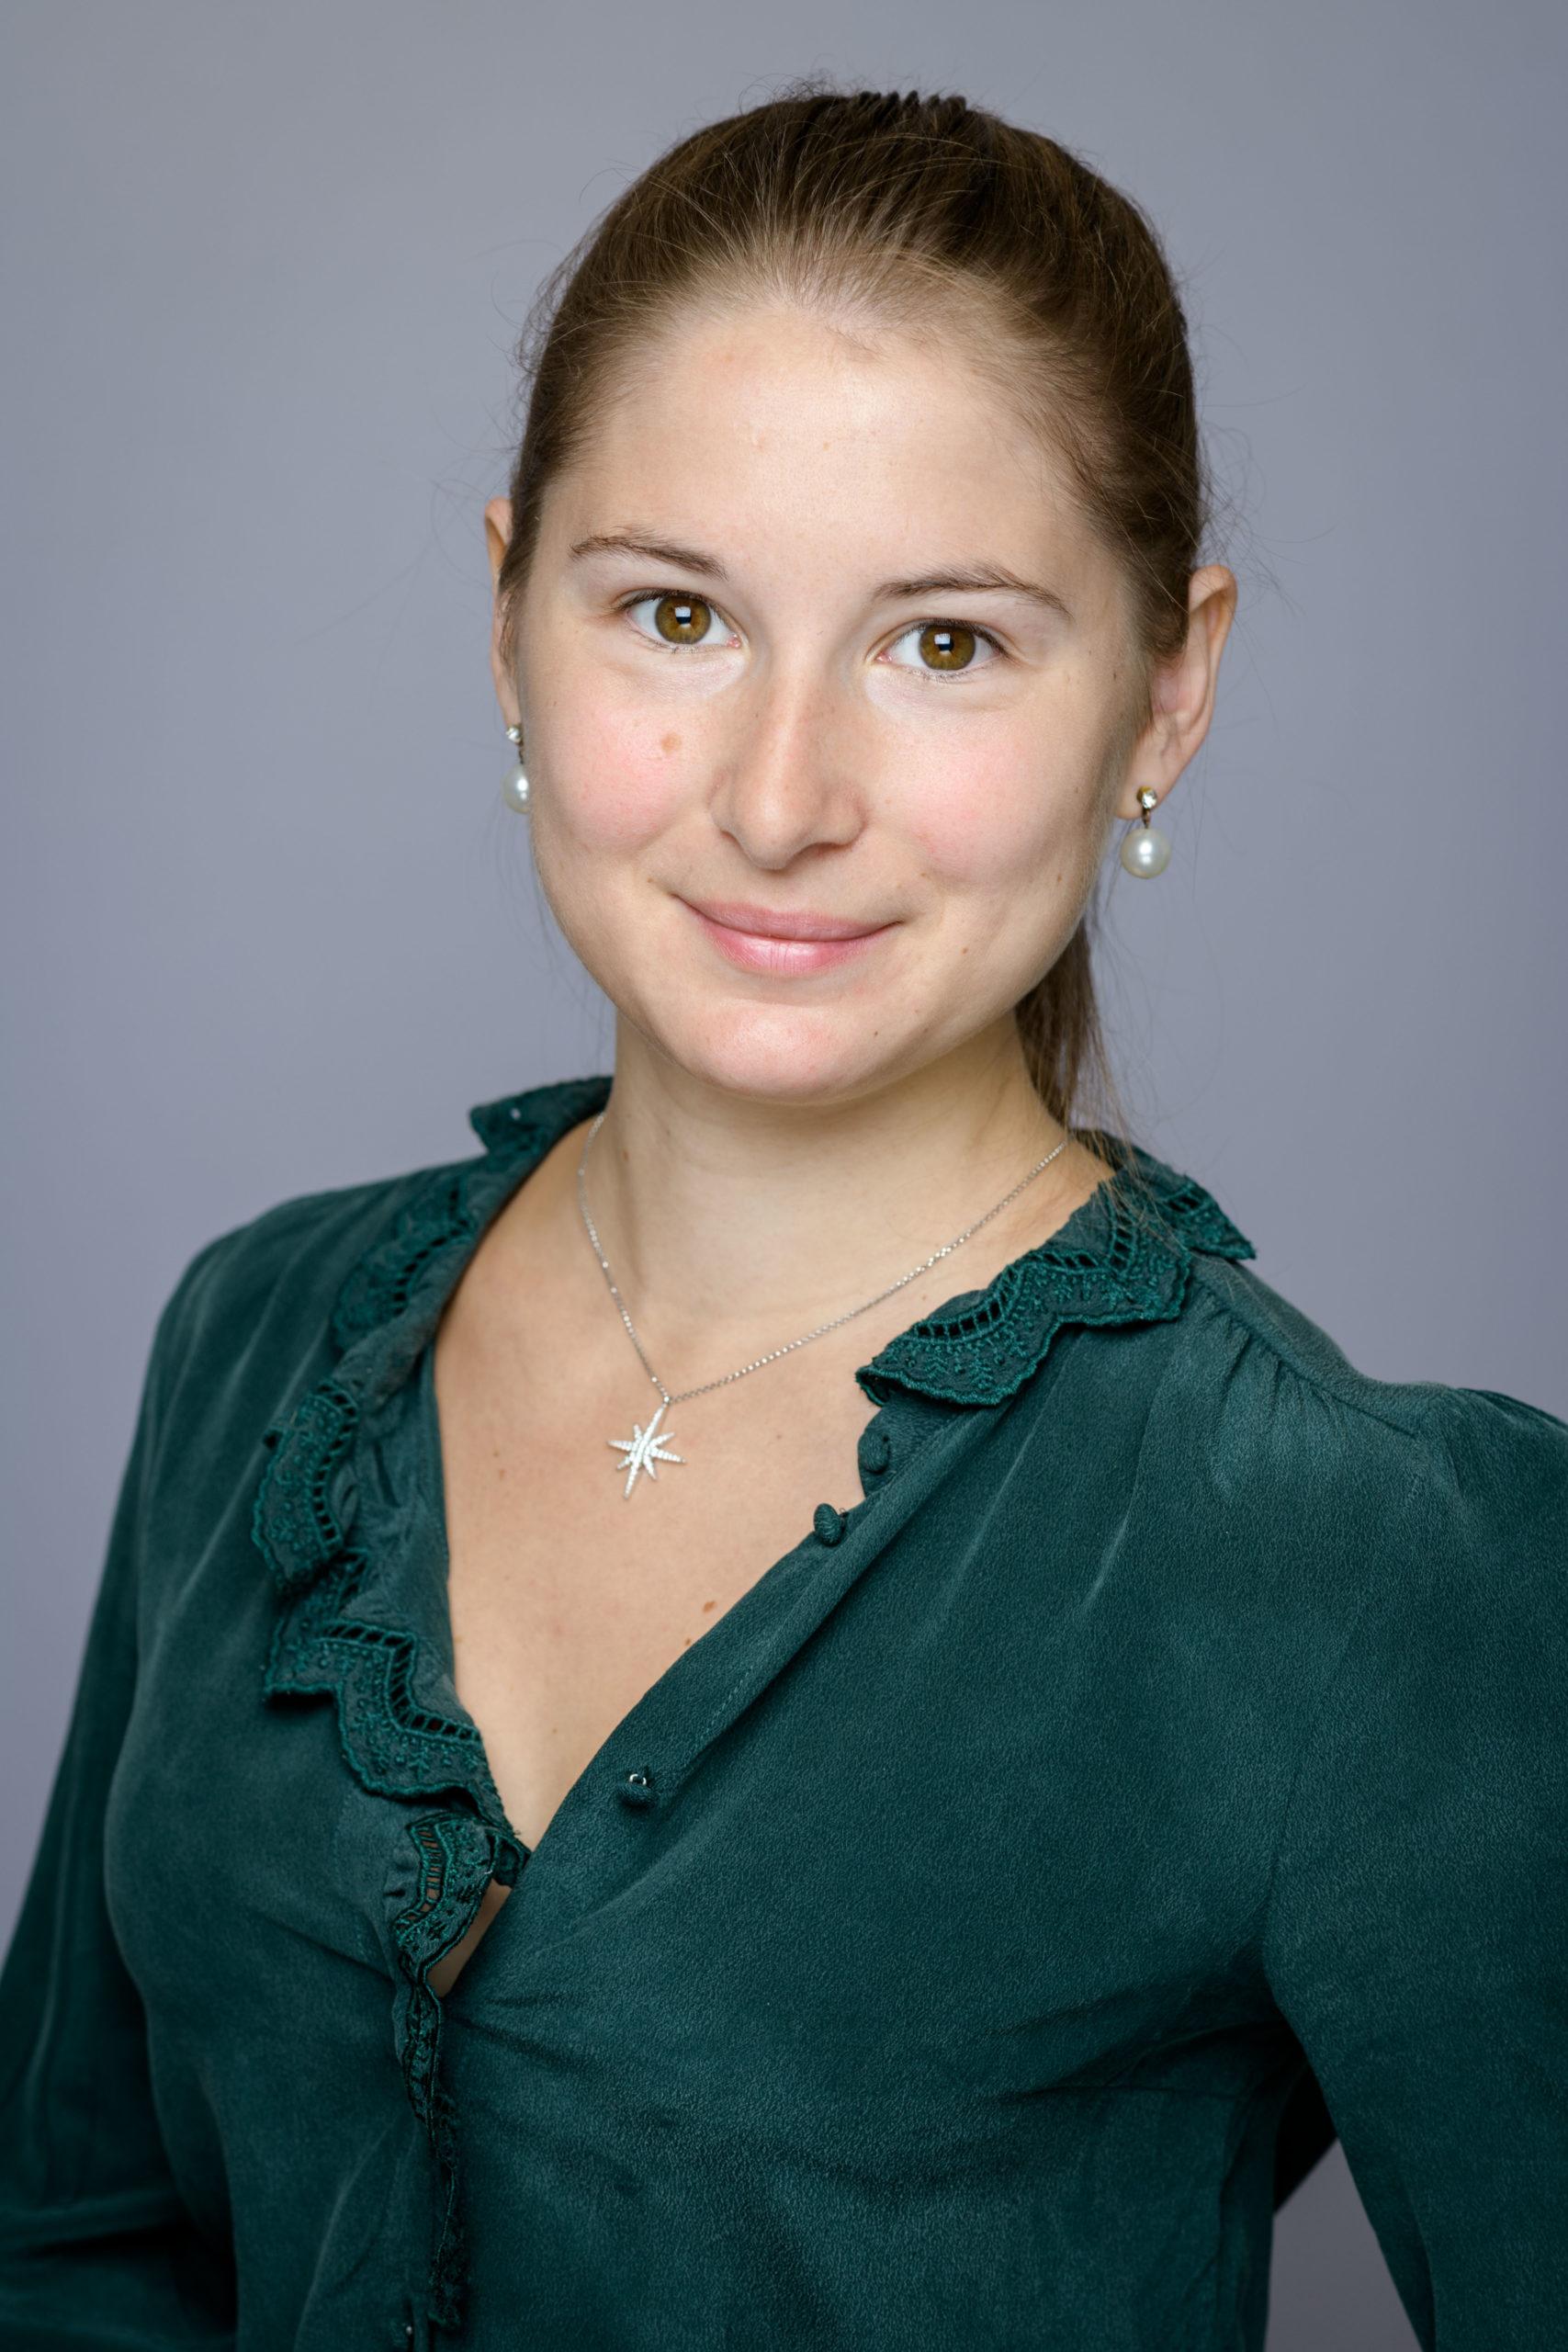 Laurianne Haution